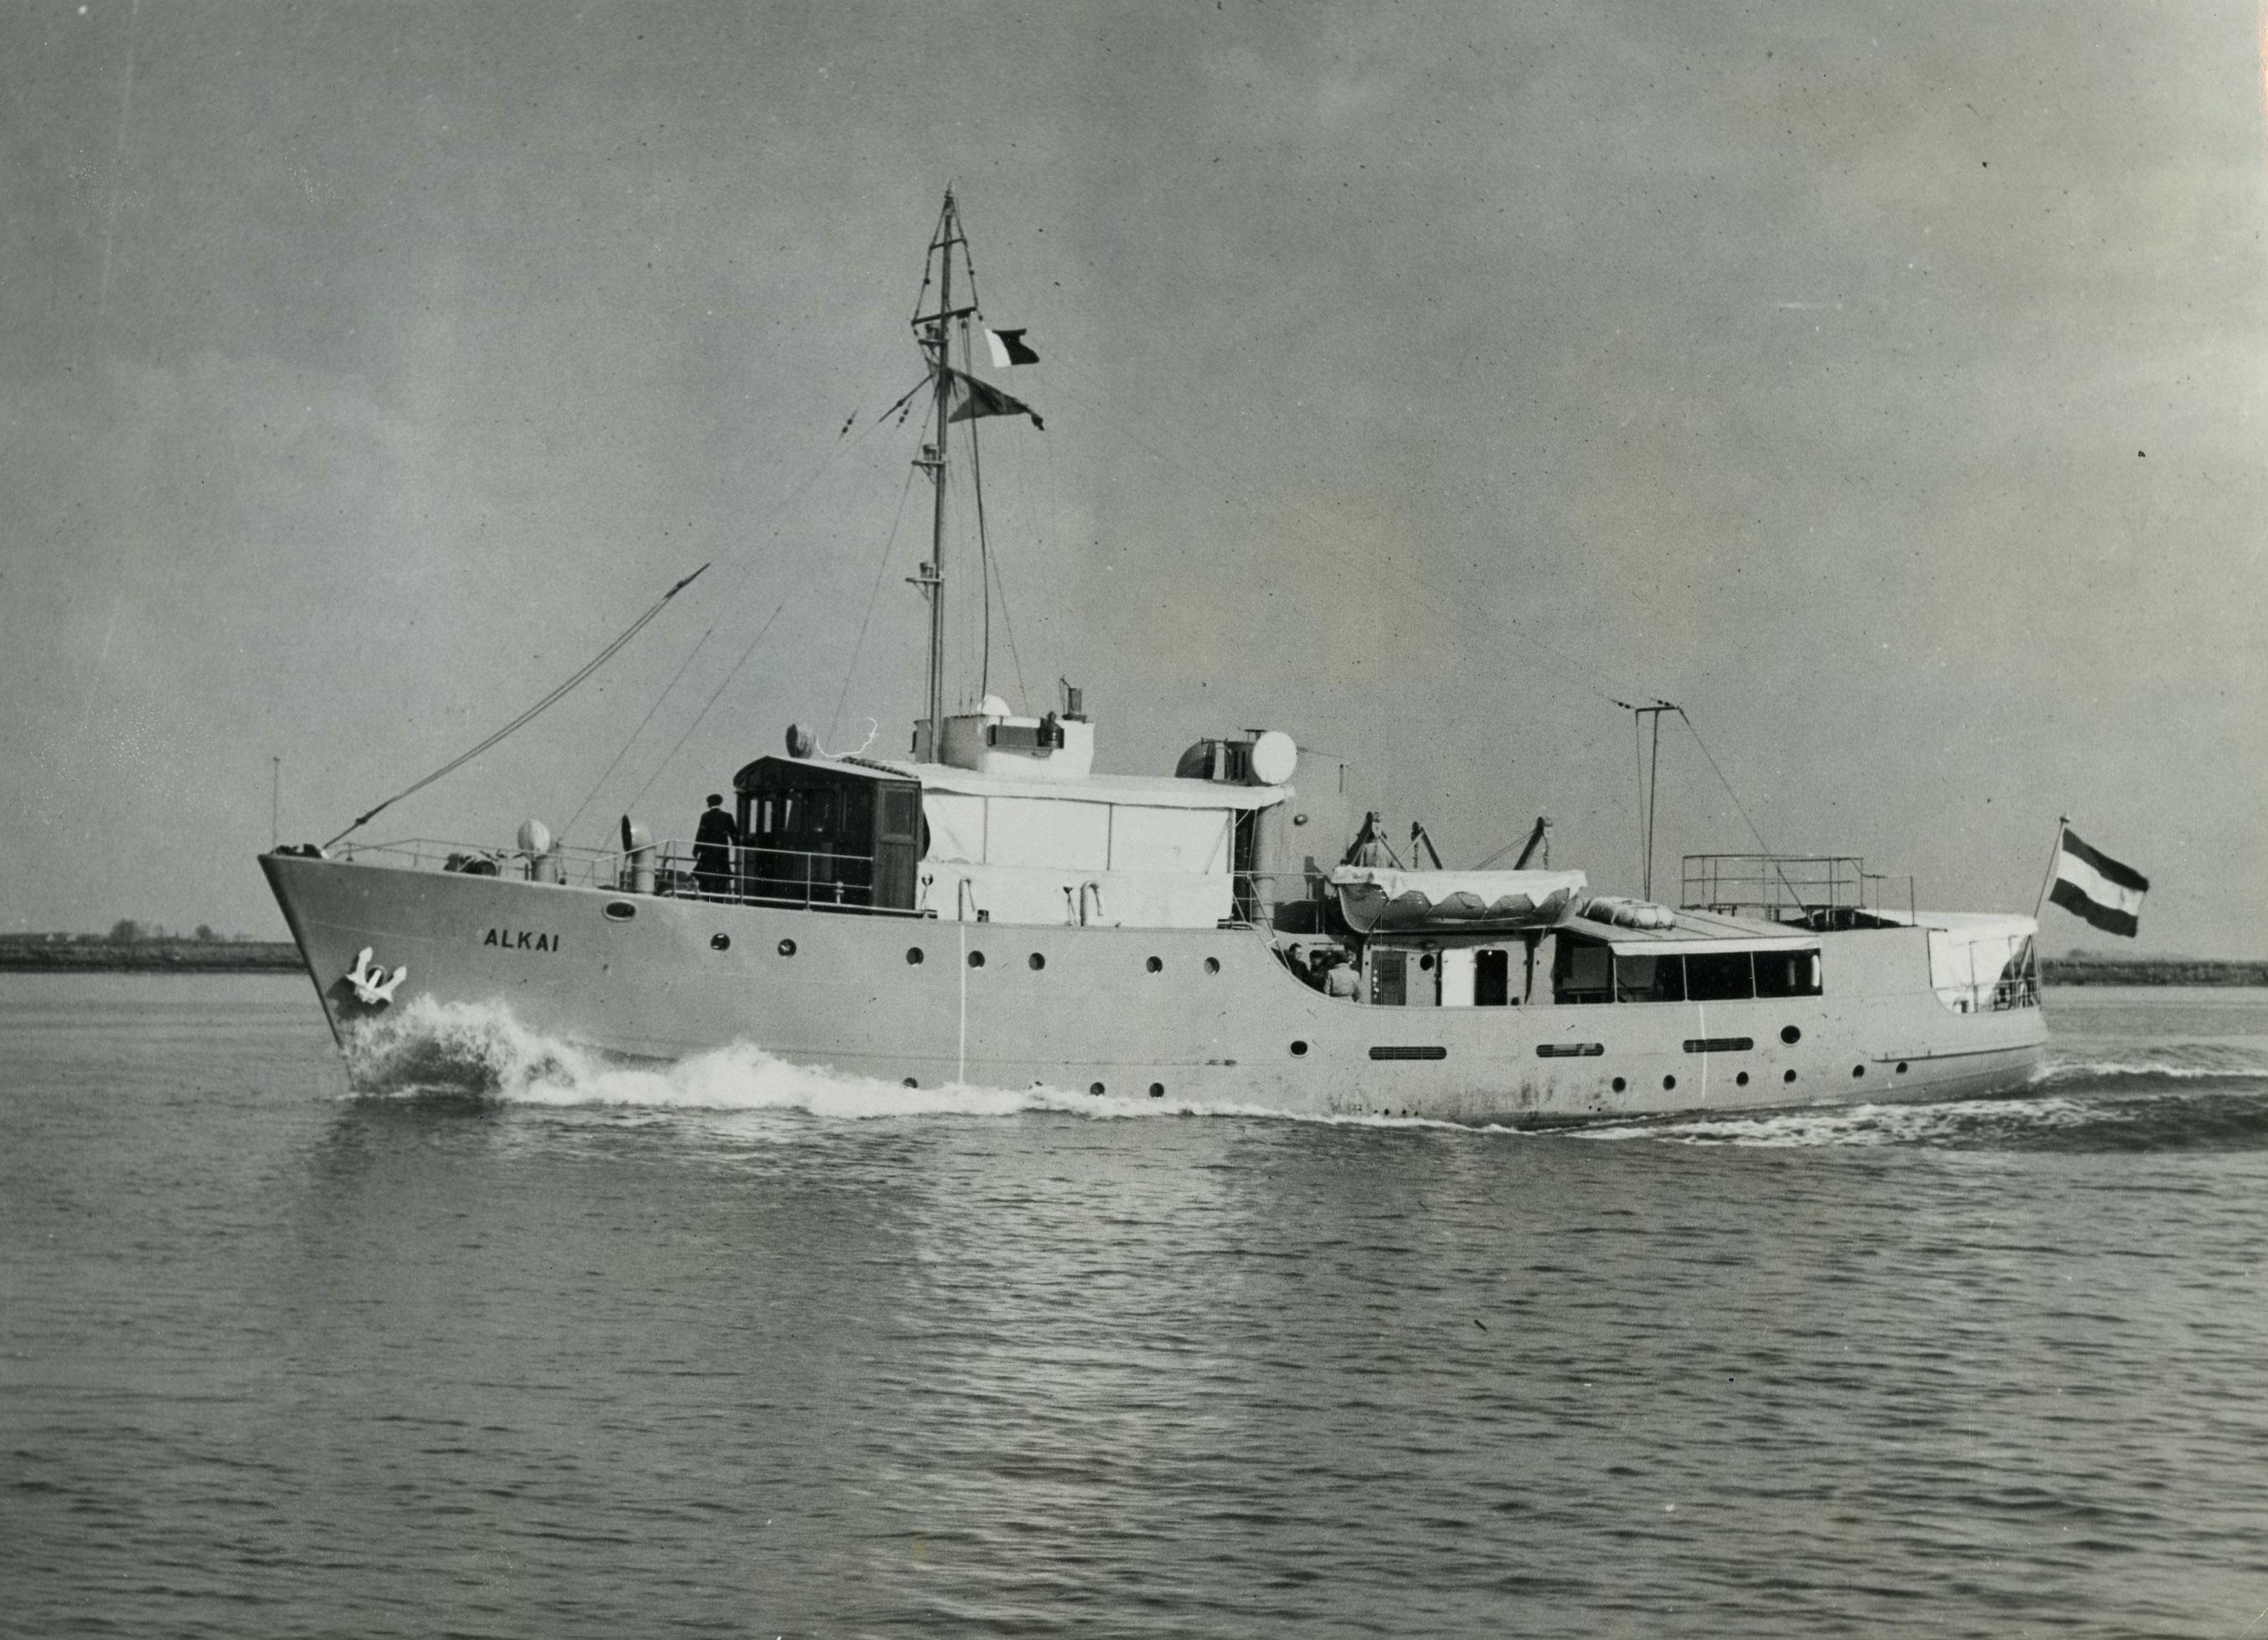 Bnrs. 958-959-960: Alkai-Allap-Aloeloe (1950)